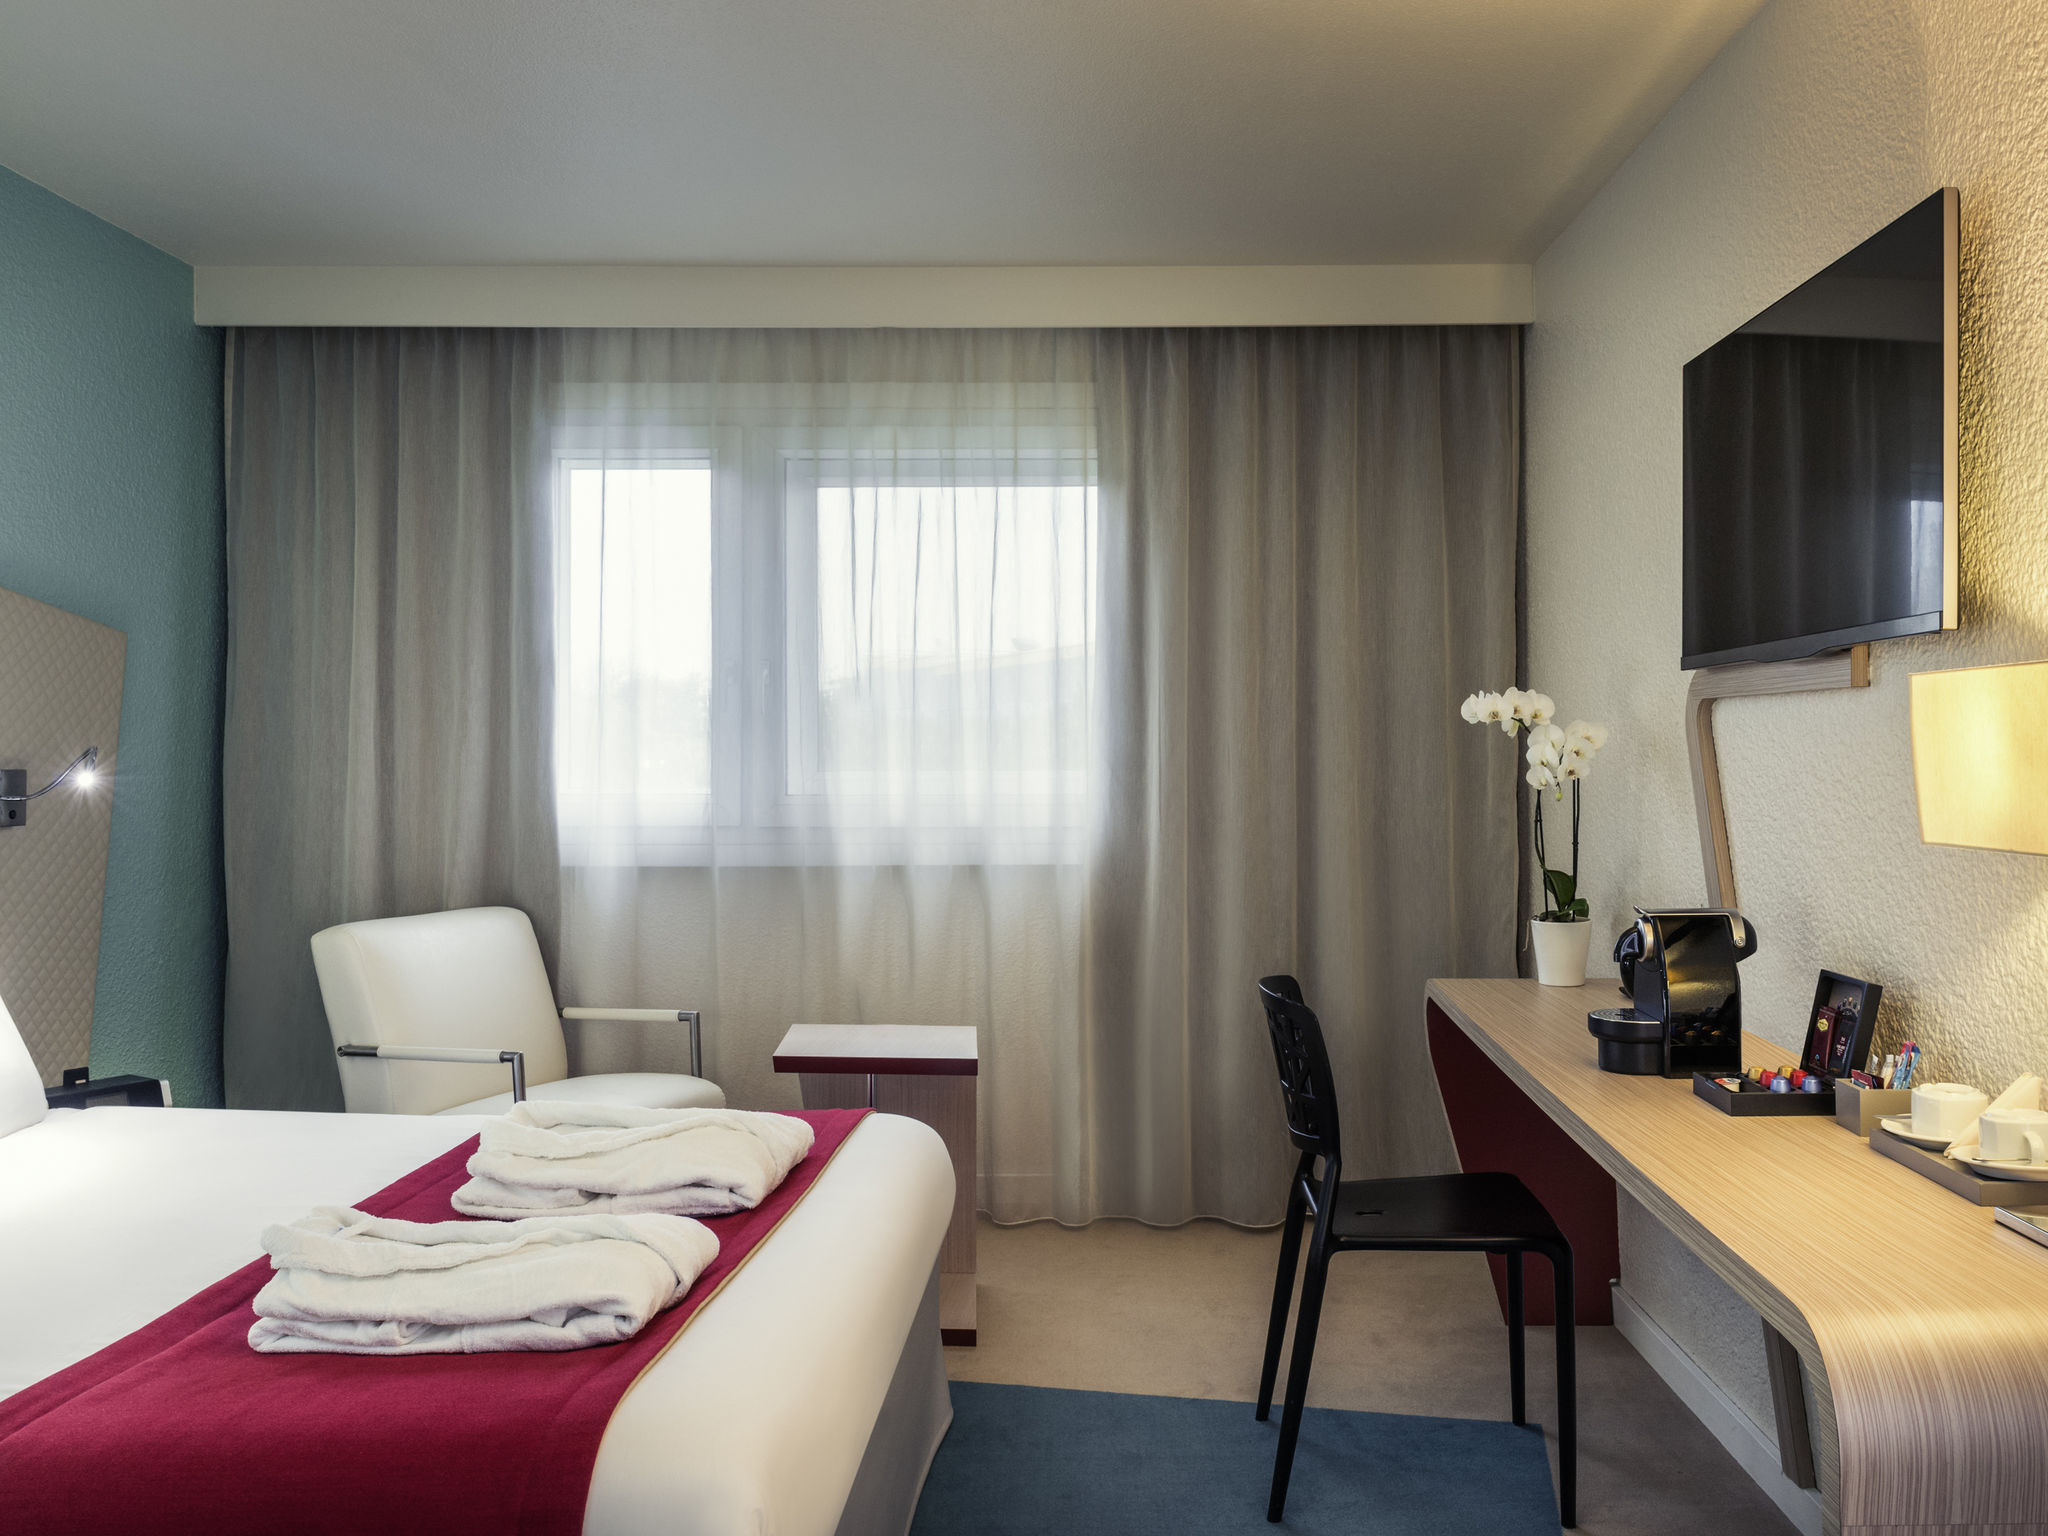 Hotel – Hotel Mercure Parijs Le Bourget